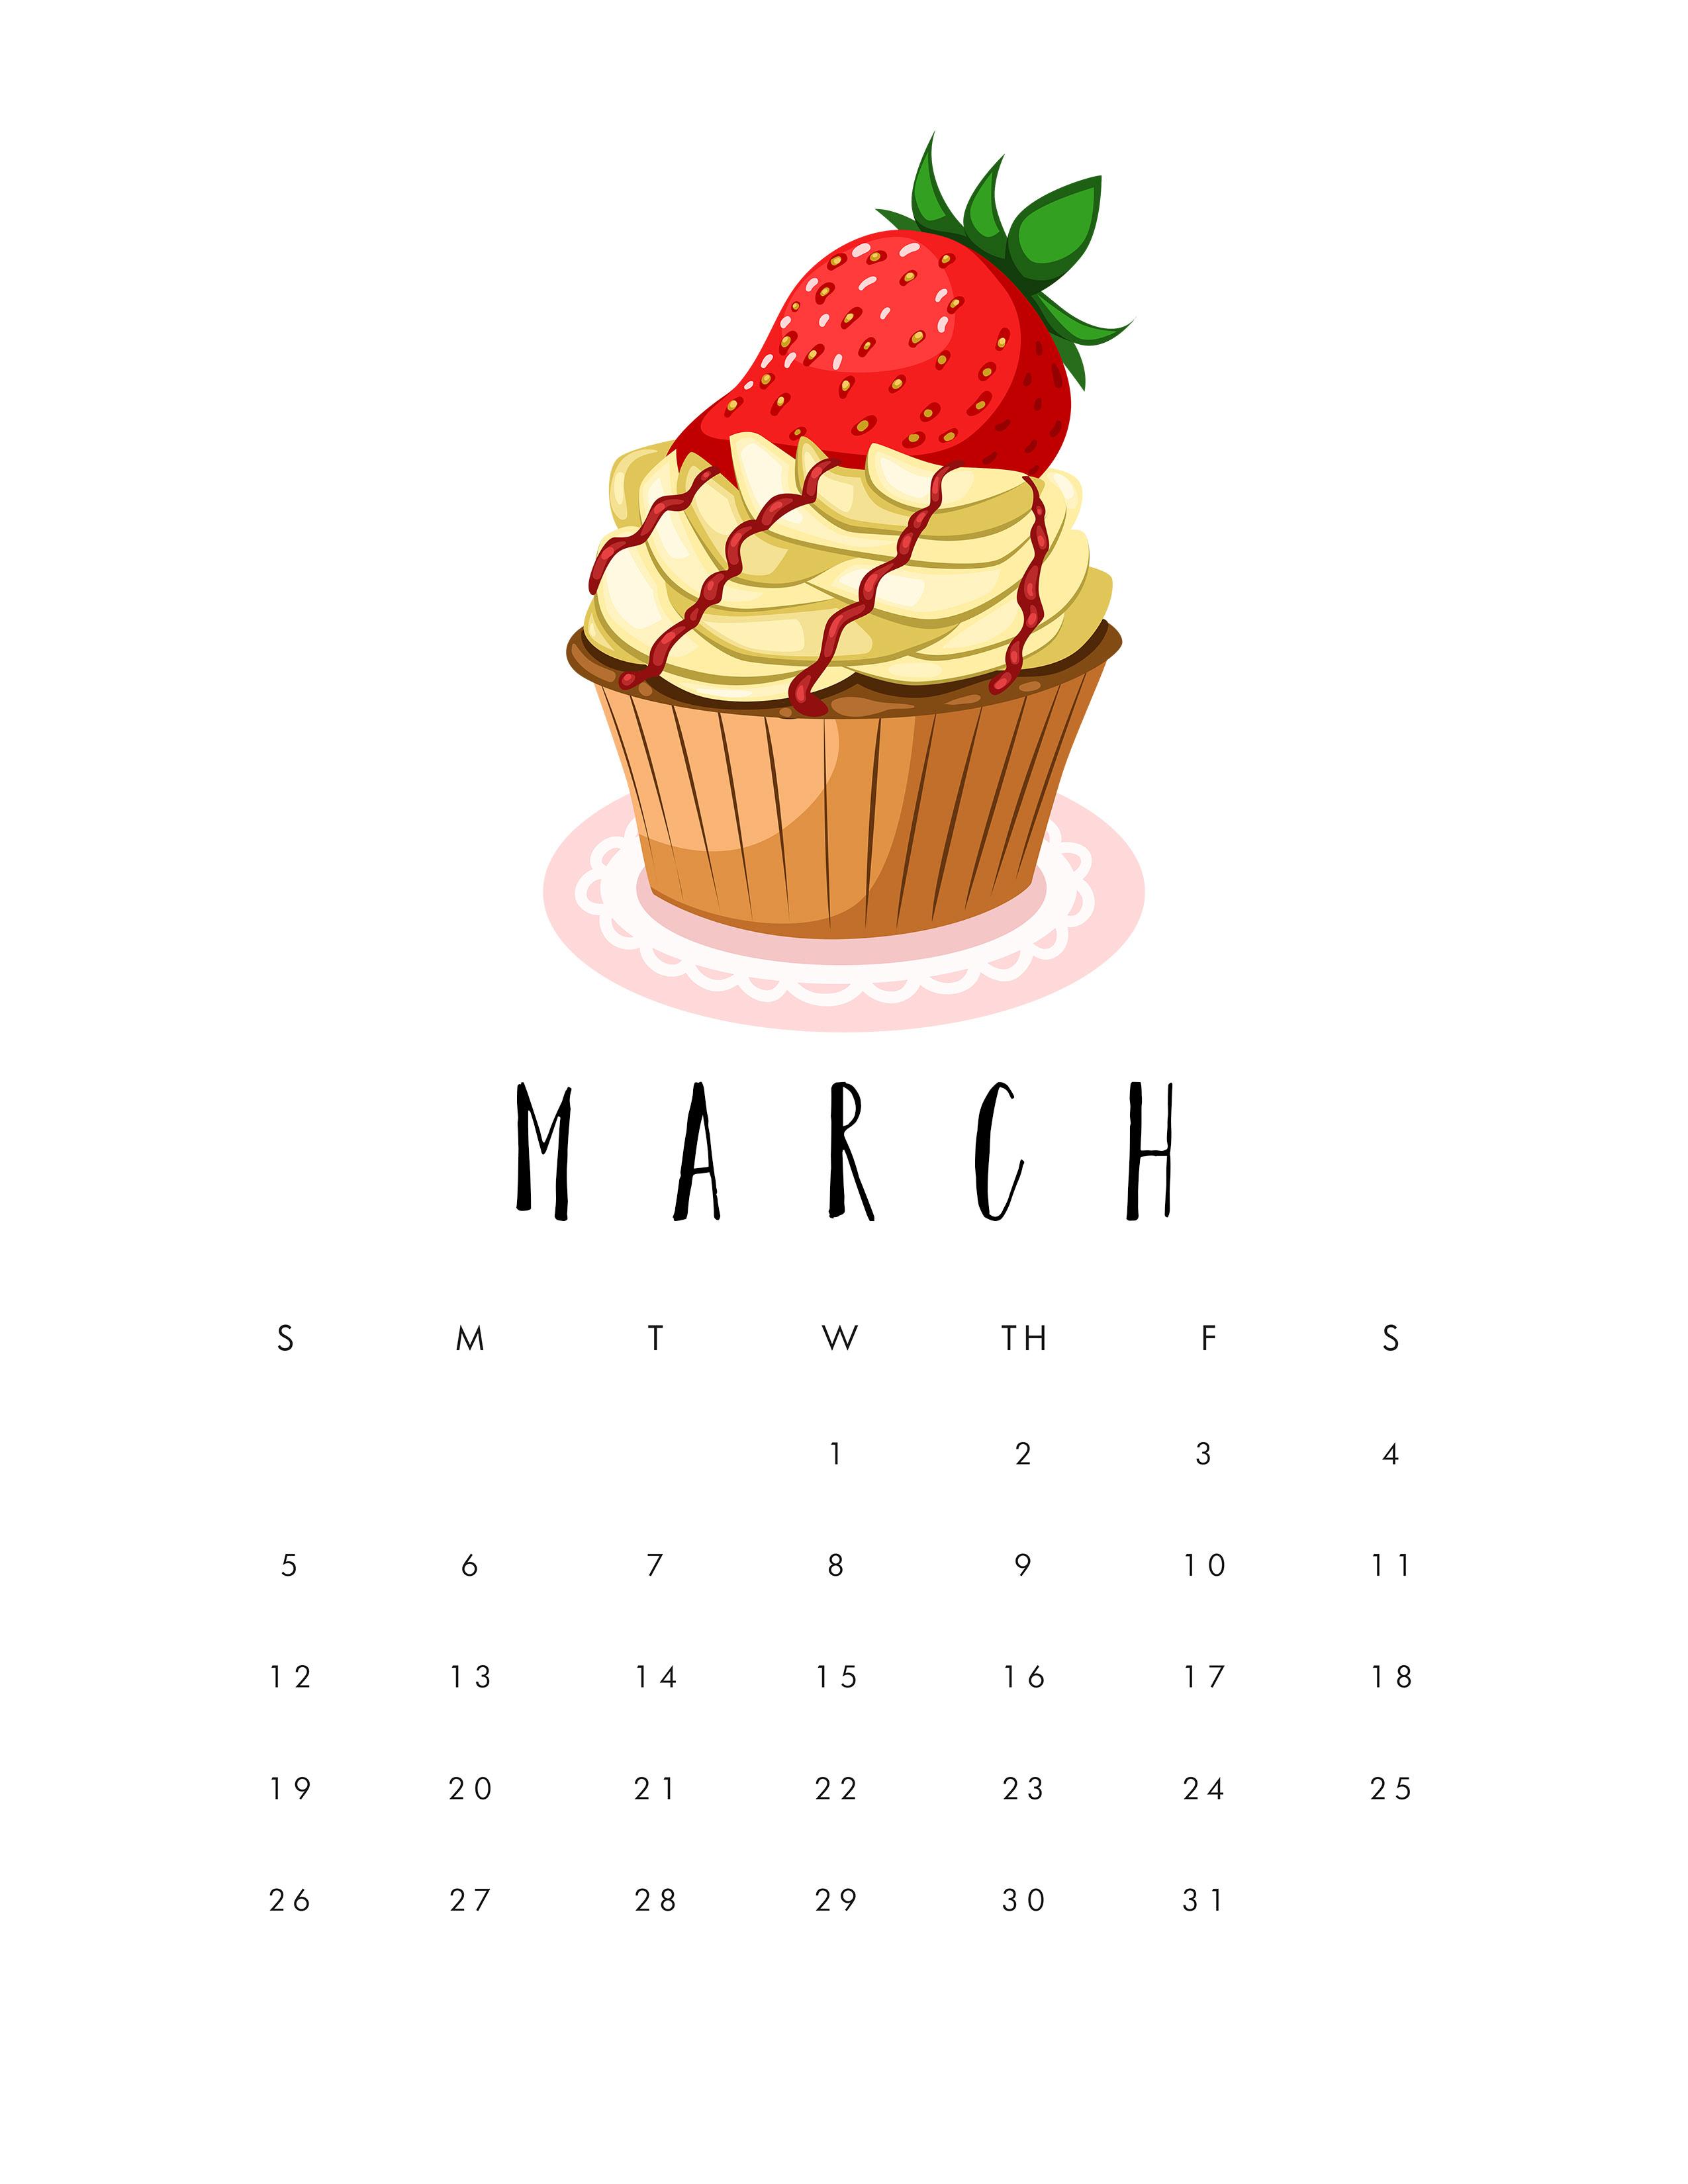 March 2017 Popsugar Must Have Box Review: Free Printable 2017 Cupcake Calendar